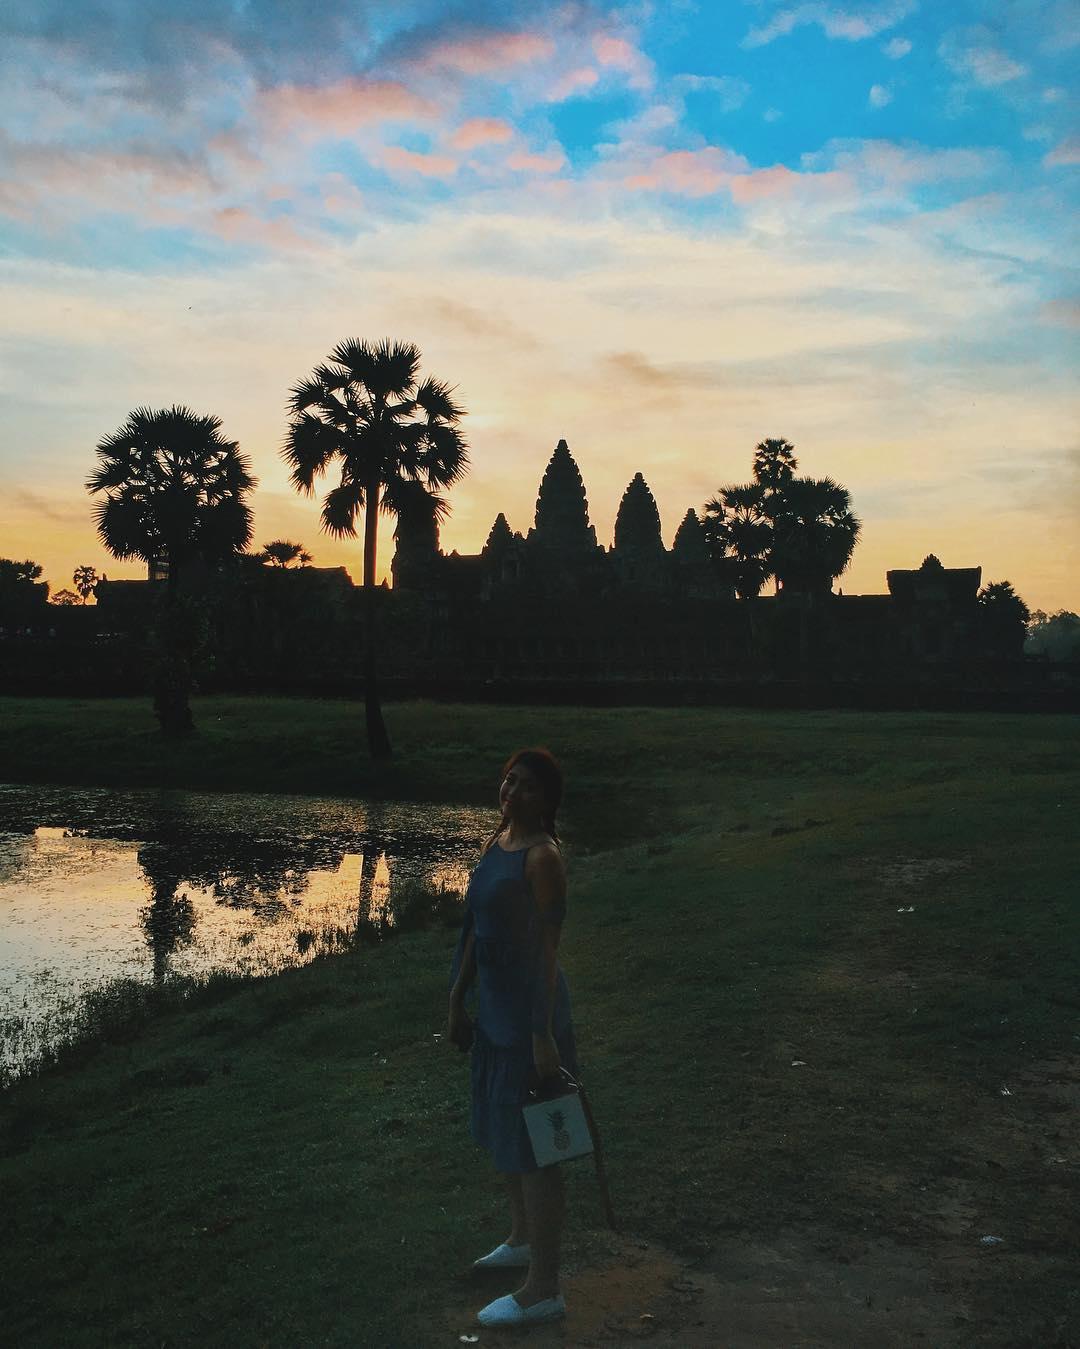 Top 4 Instagrammable Spots In Cambodia (Siem Reap)